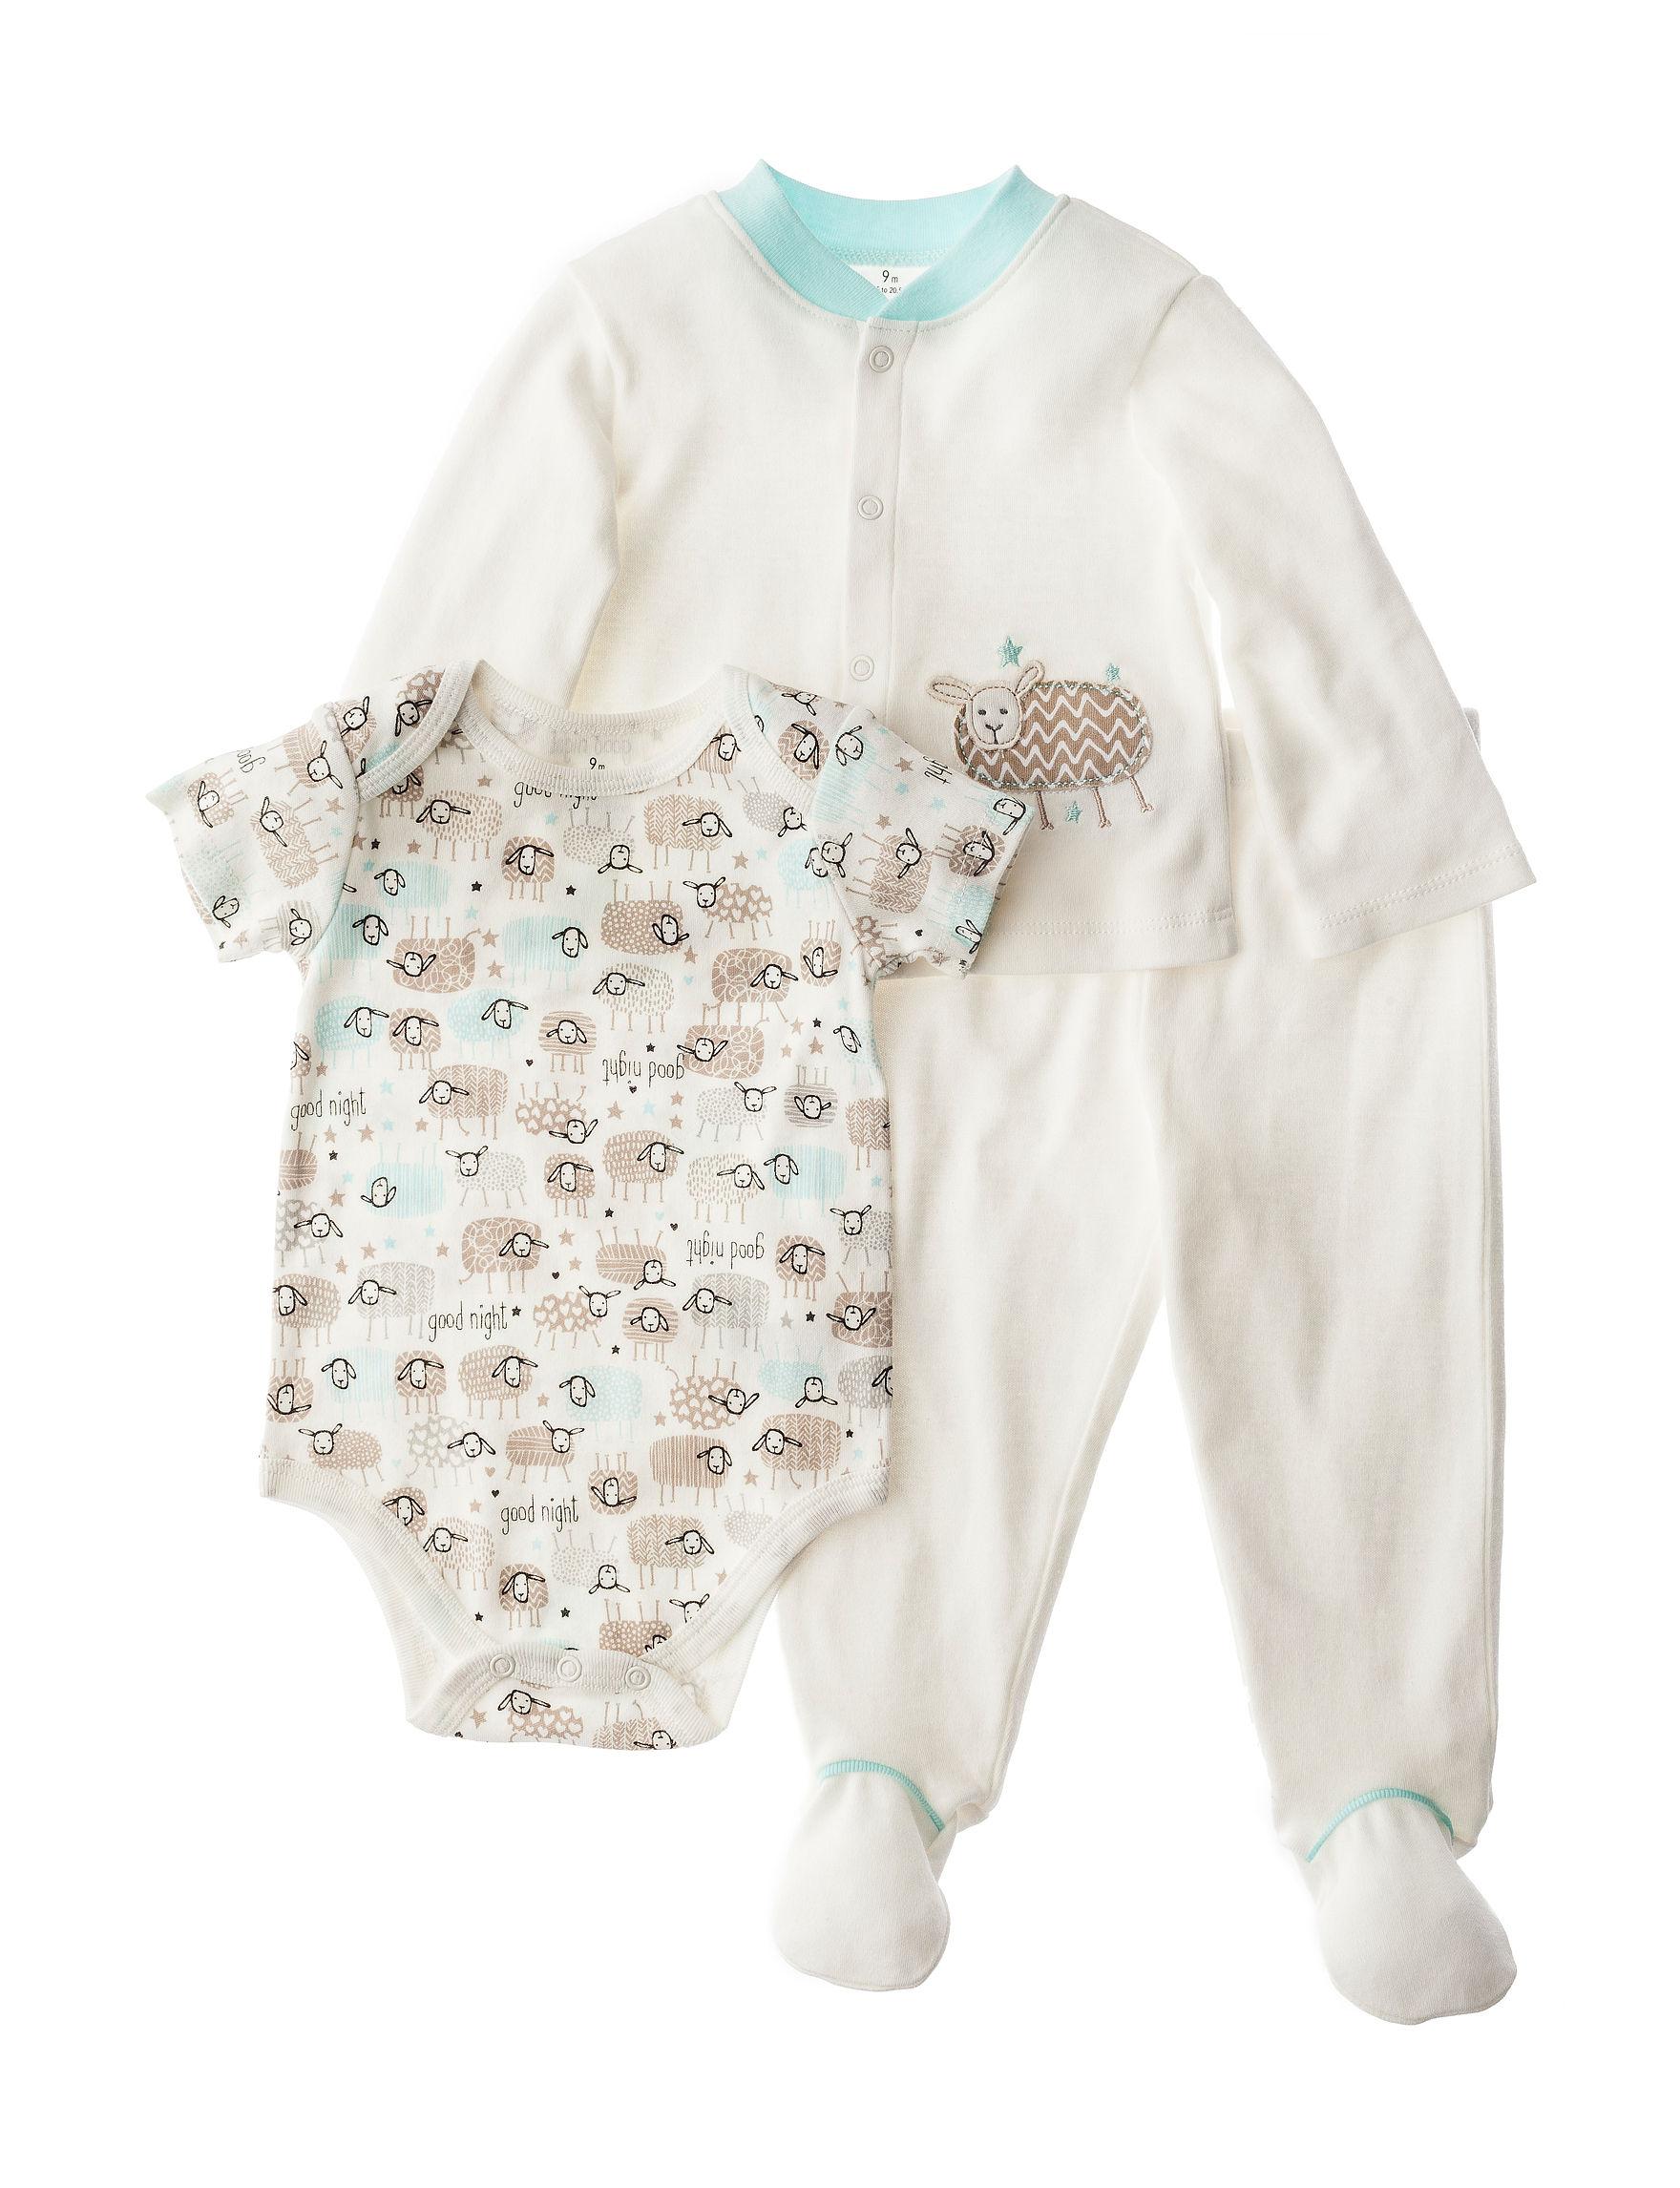 Baby Starters White